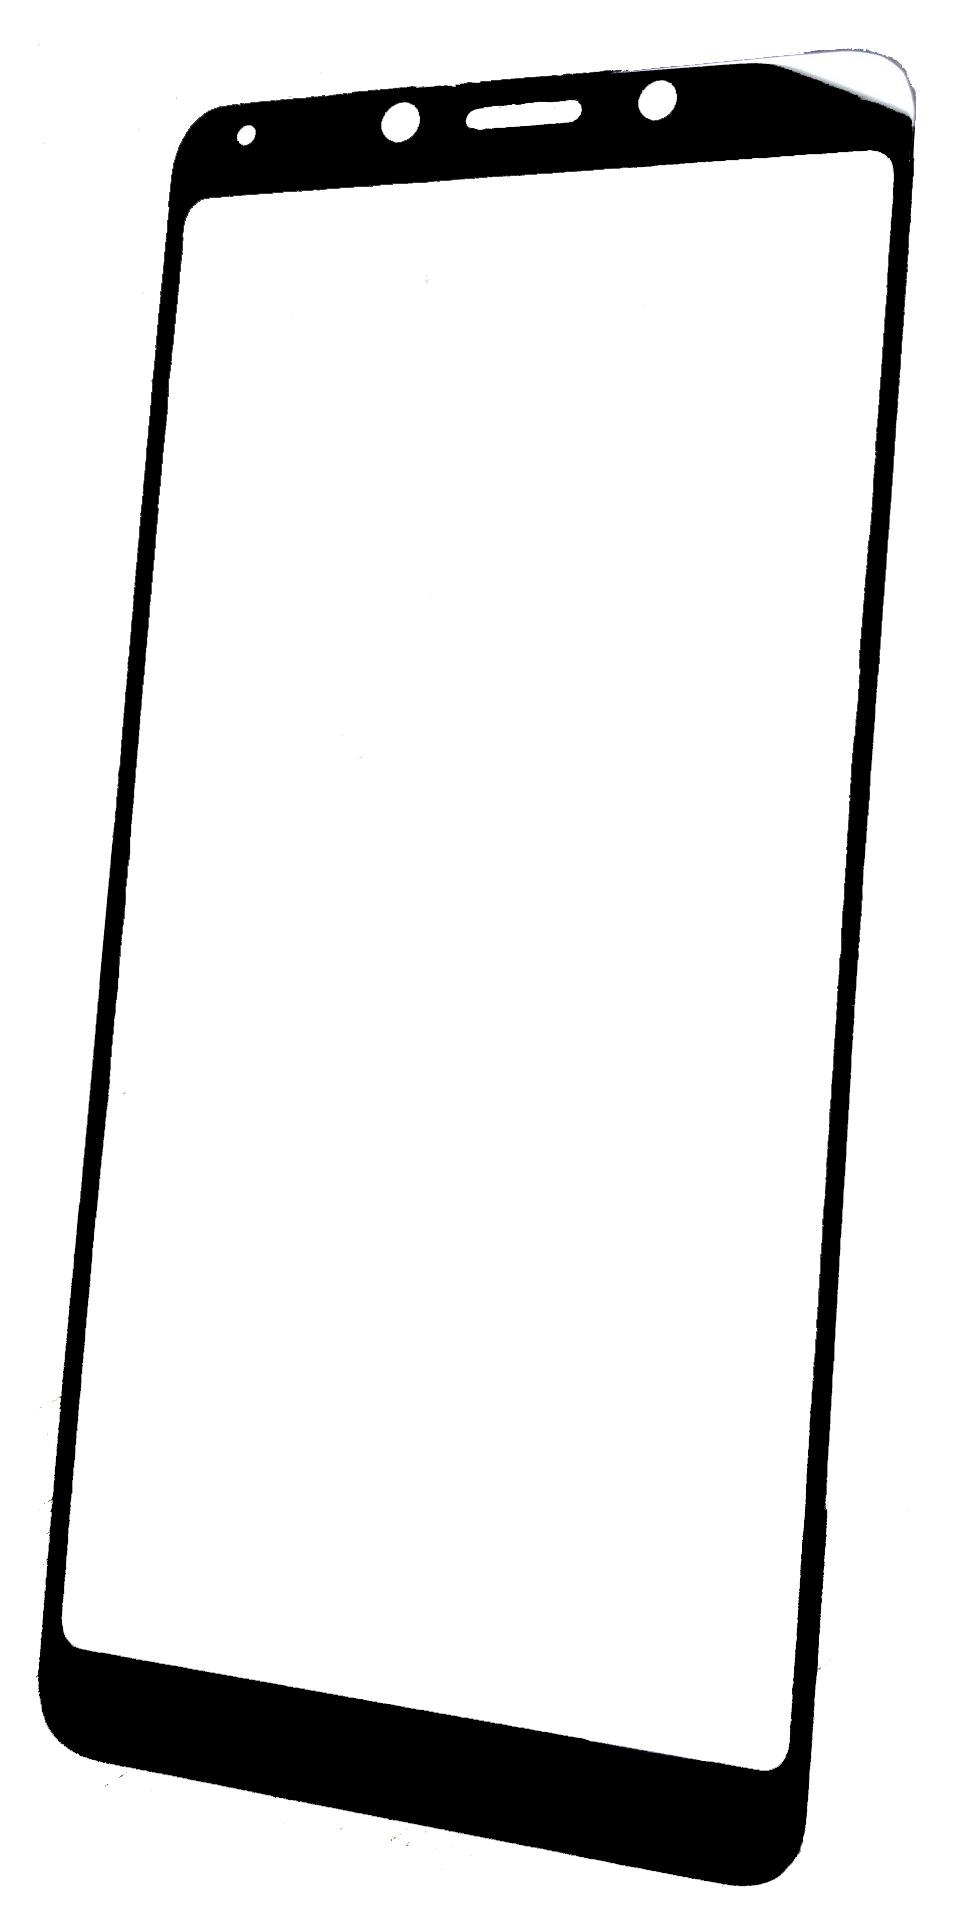 Защитное стекло Xiaomi Redmi 6 / Redmi 6A (Full Glue, черная рамка) защитное стекло для xiaomi redmi 4x полная проклейка белая рамка